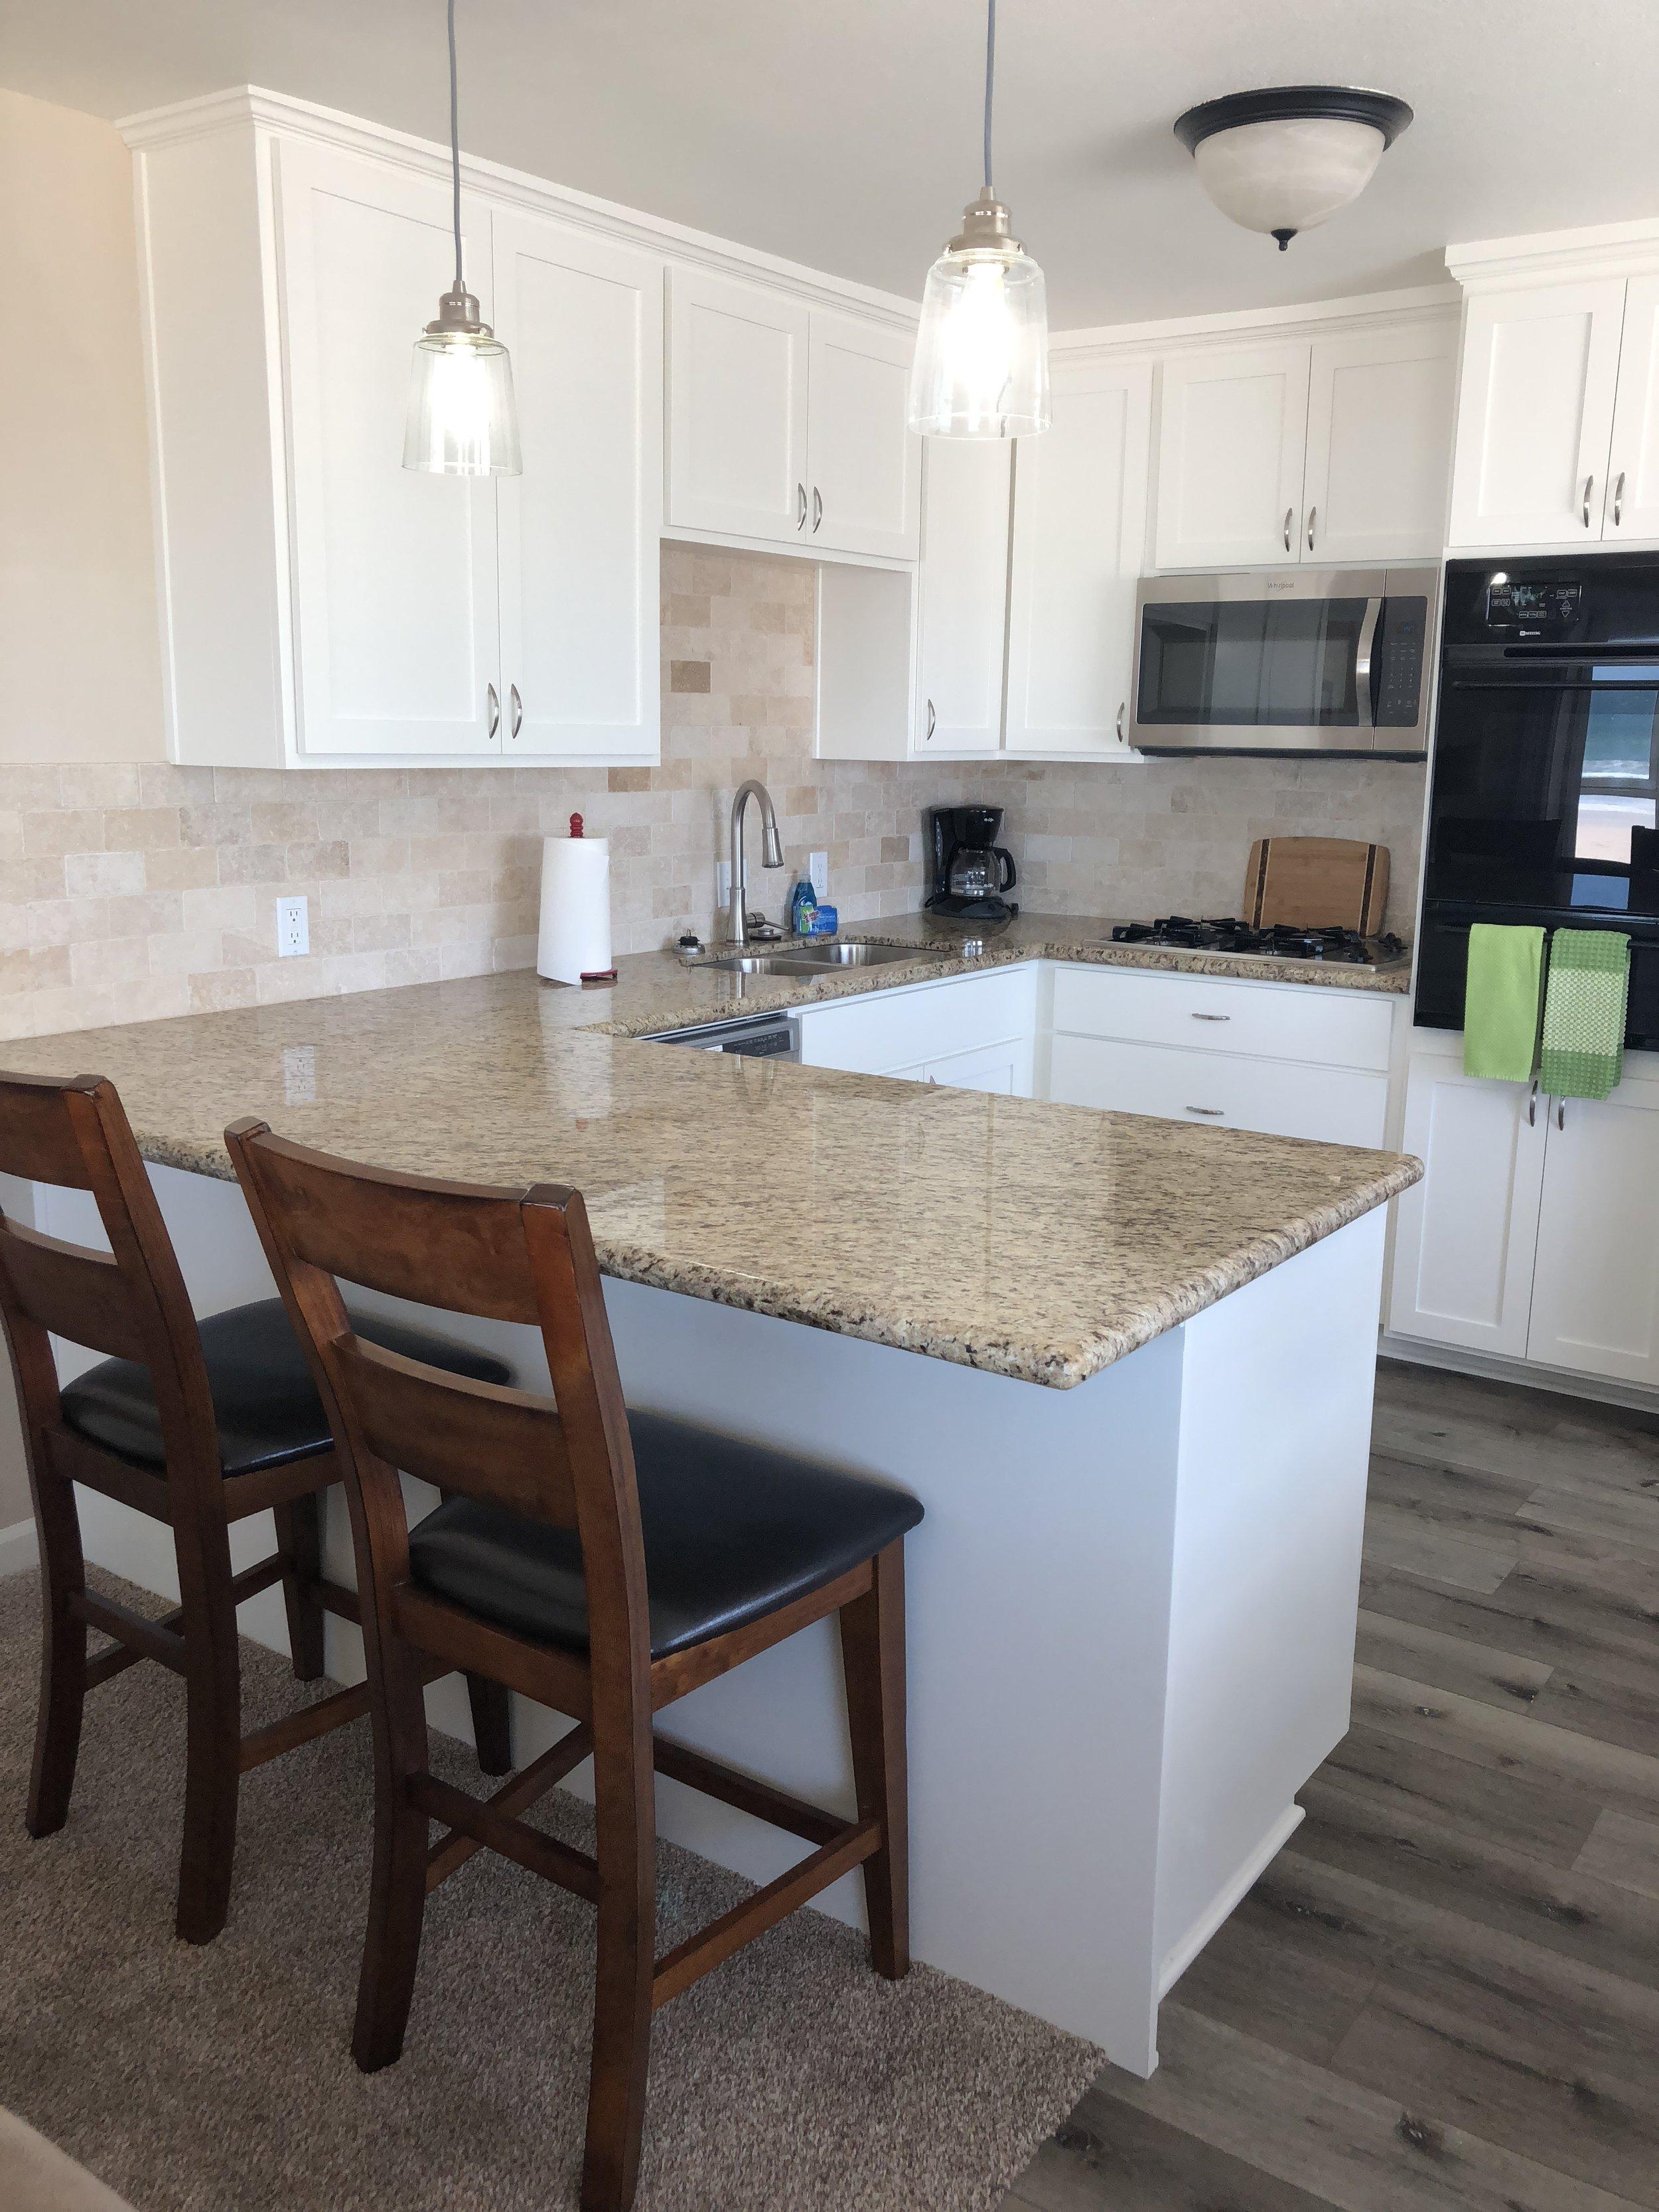 all kitchen unit 5 remodel.JPG